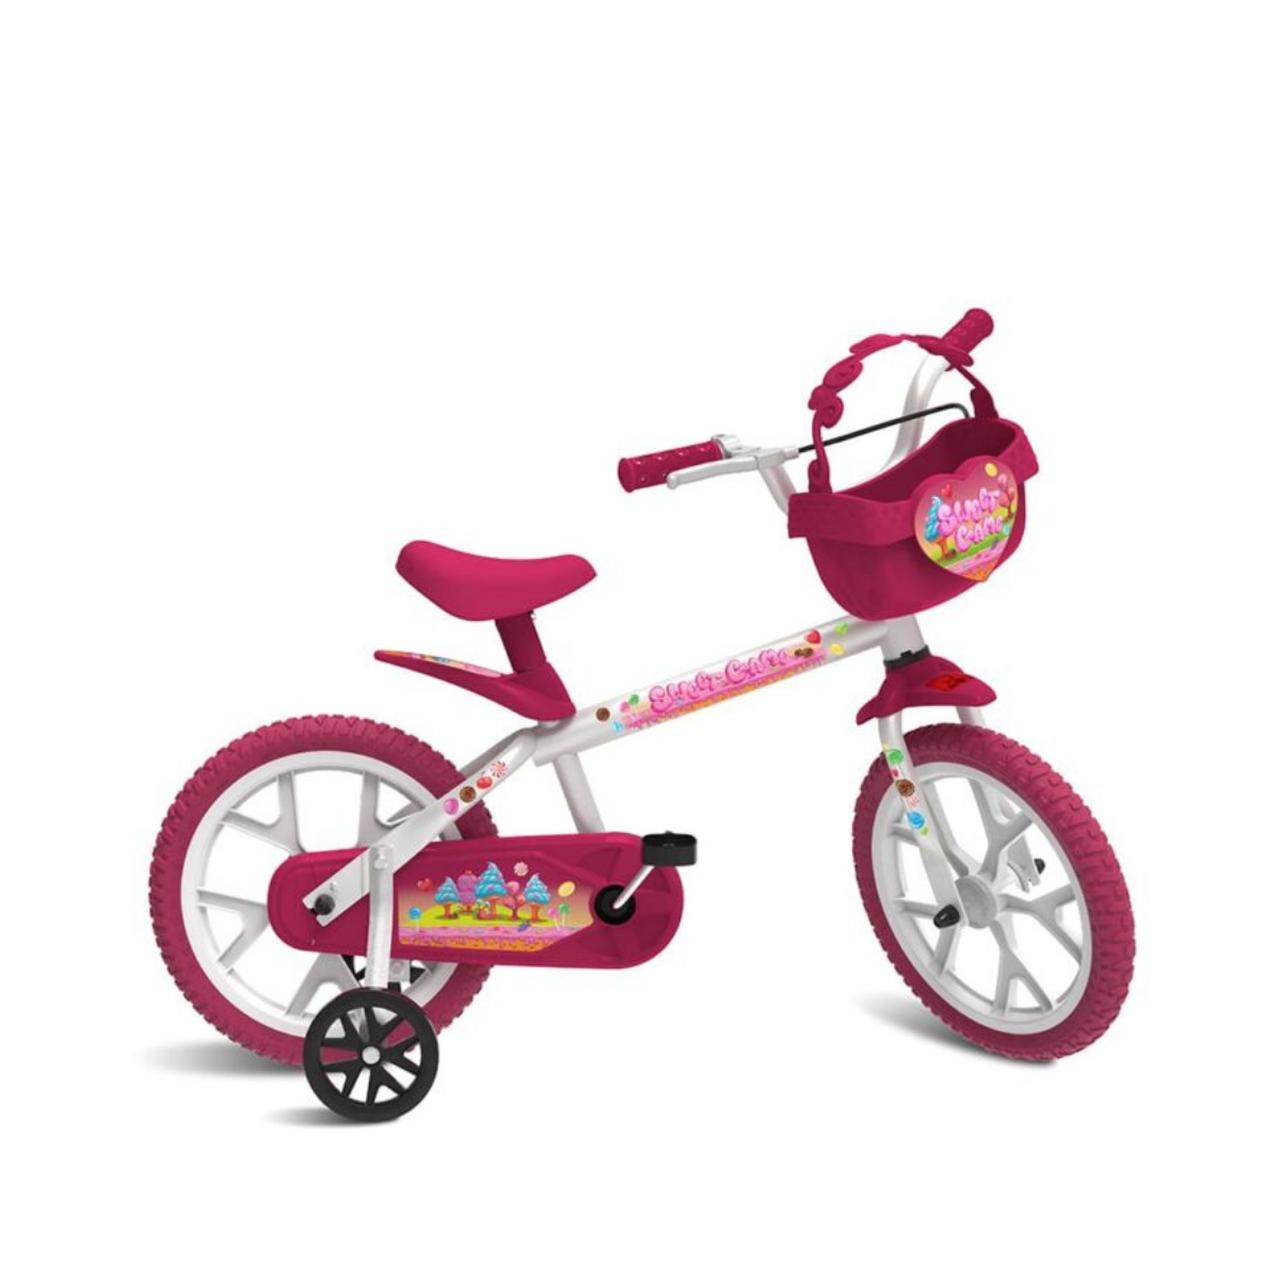 Bicicleta Sweet Game Rosa/br Aro14 Infantil Bandeirante 3068